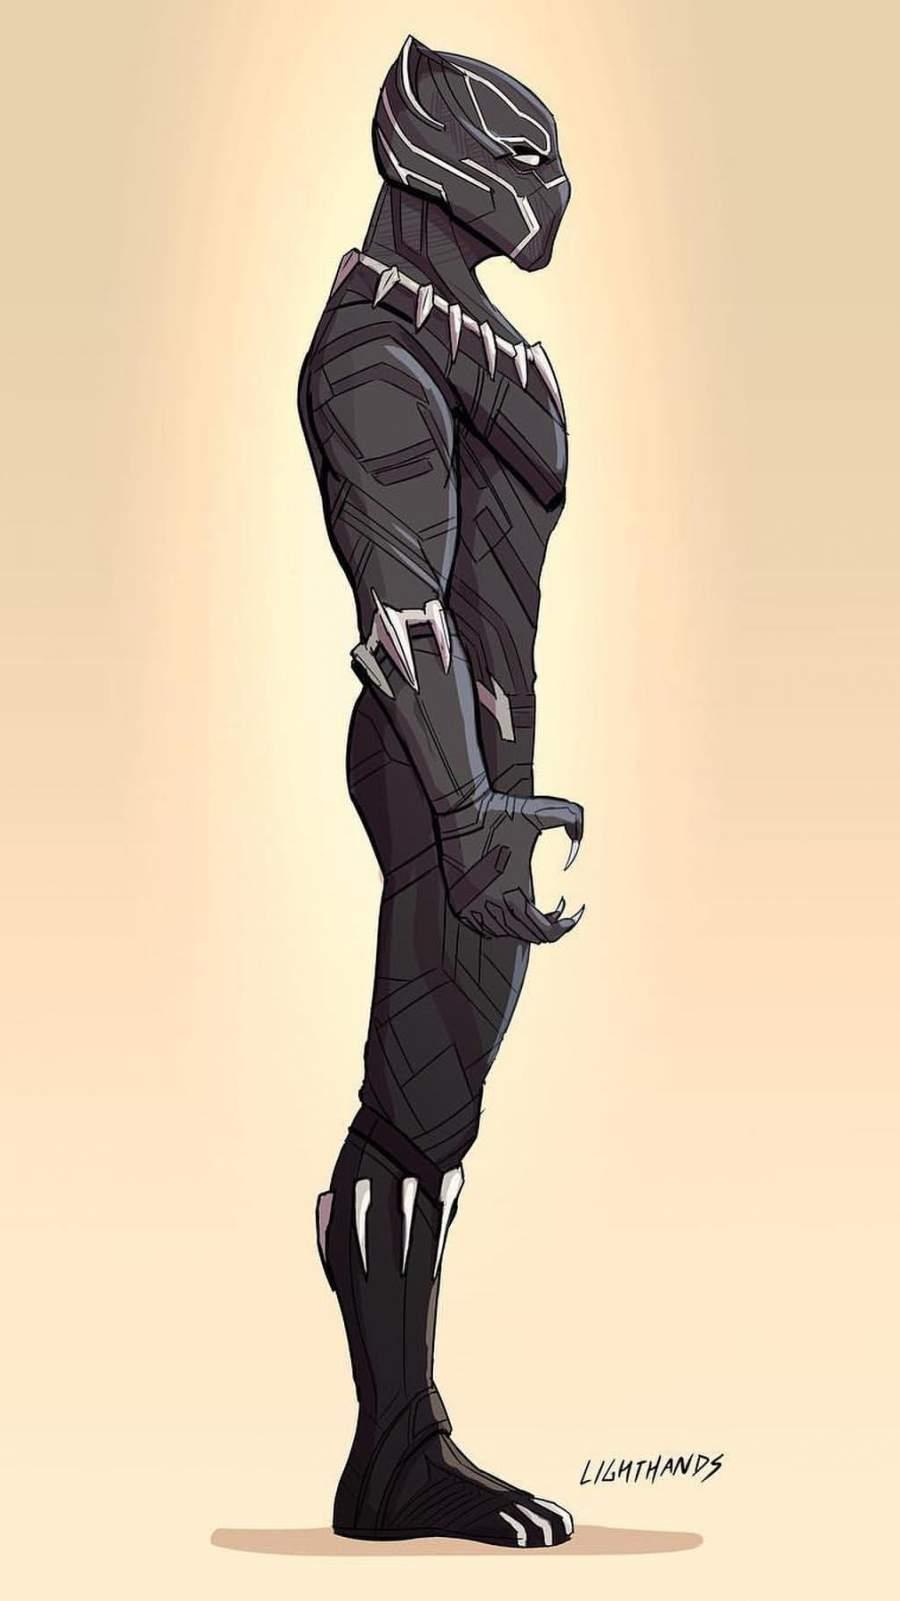 Black Panther Artwork iPhone Wallpaper